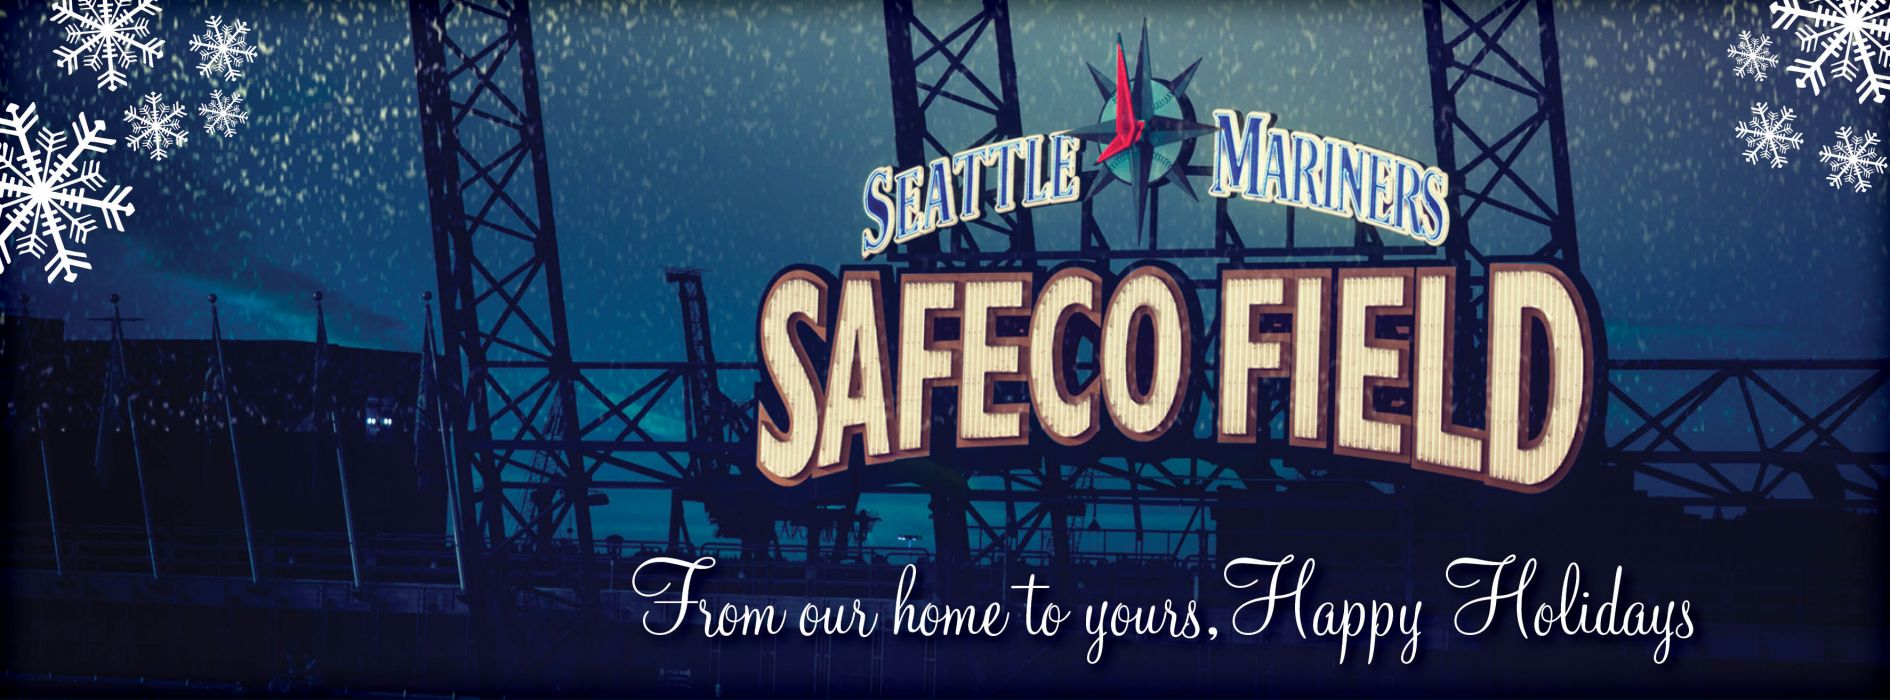 seattle mariners safeco stadium baseball mlb wallpaper